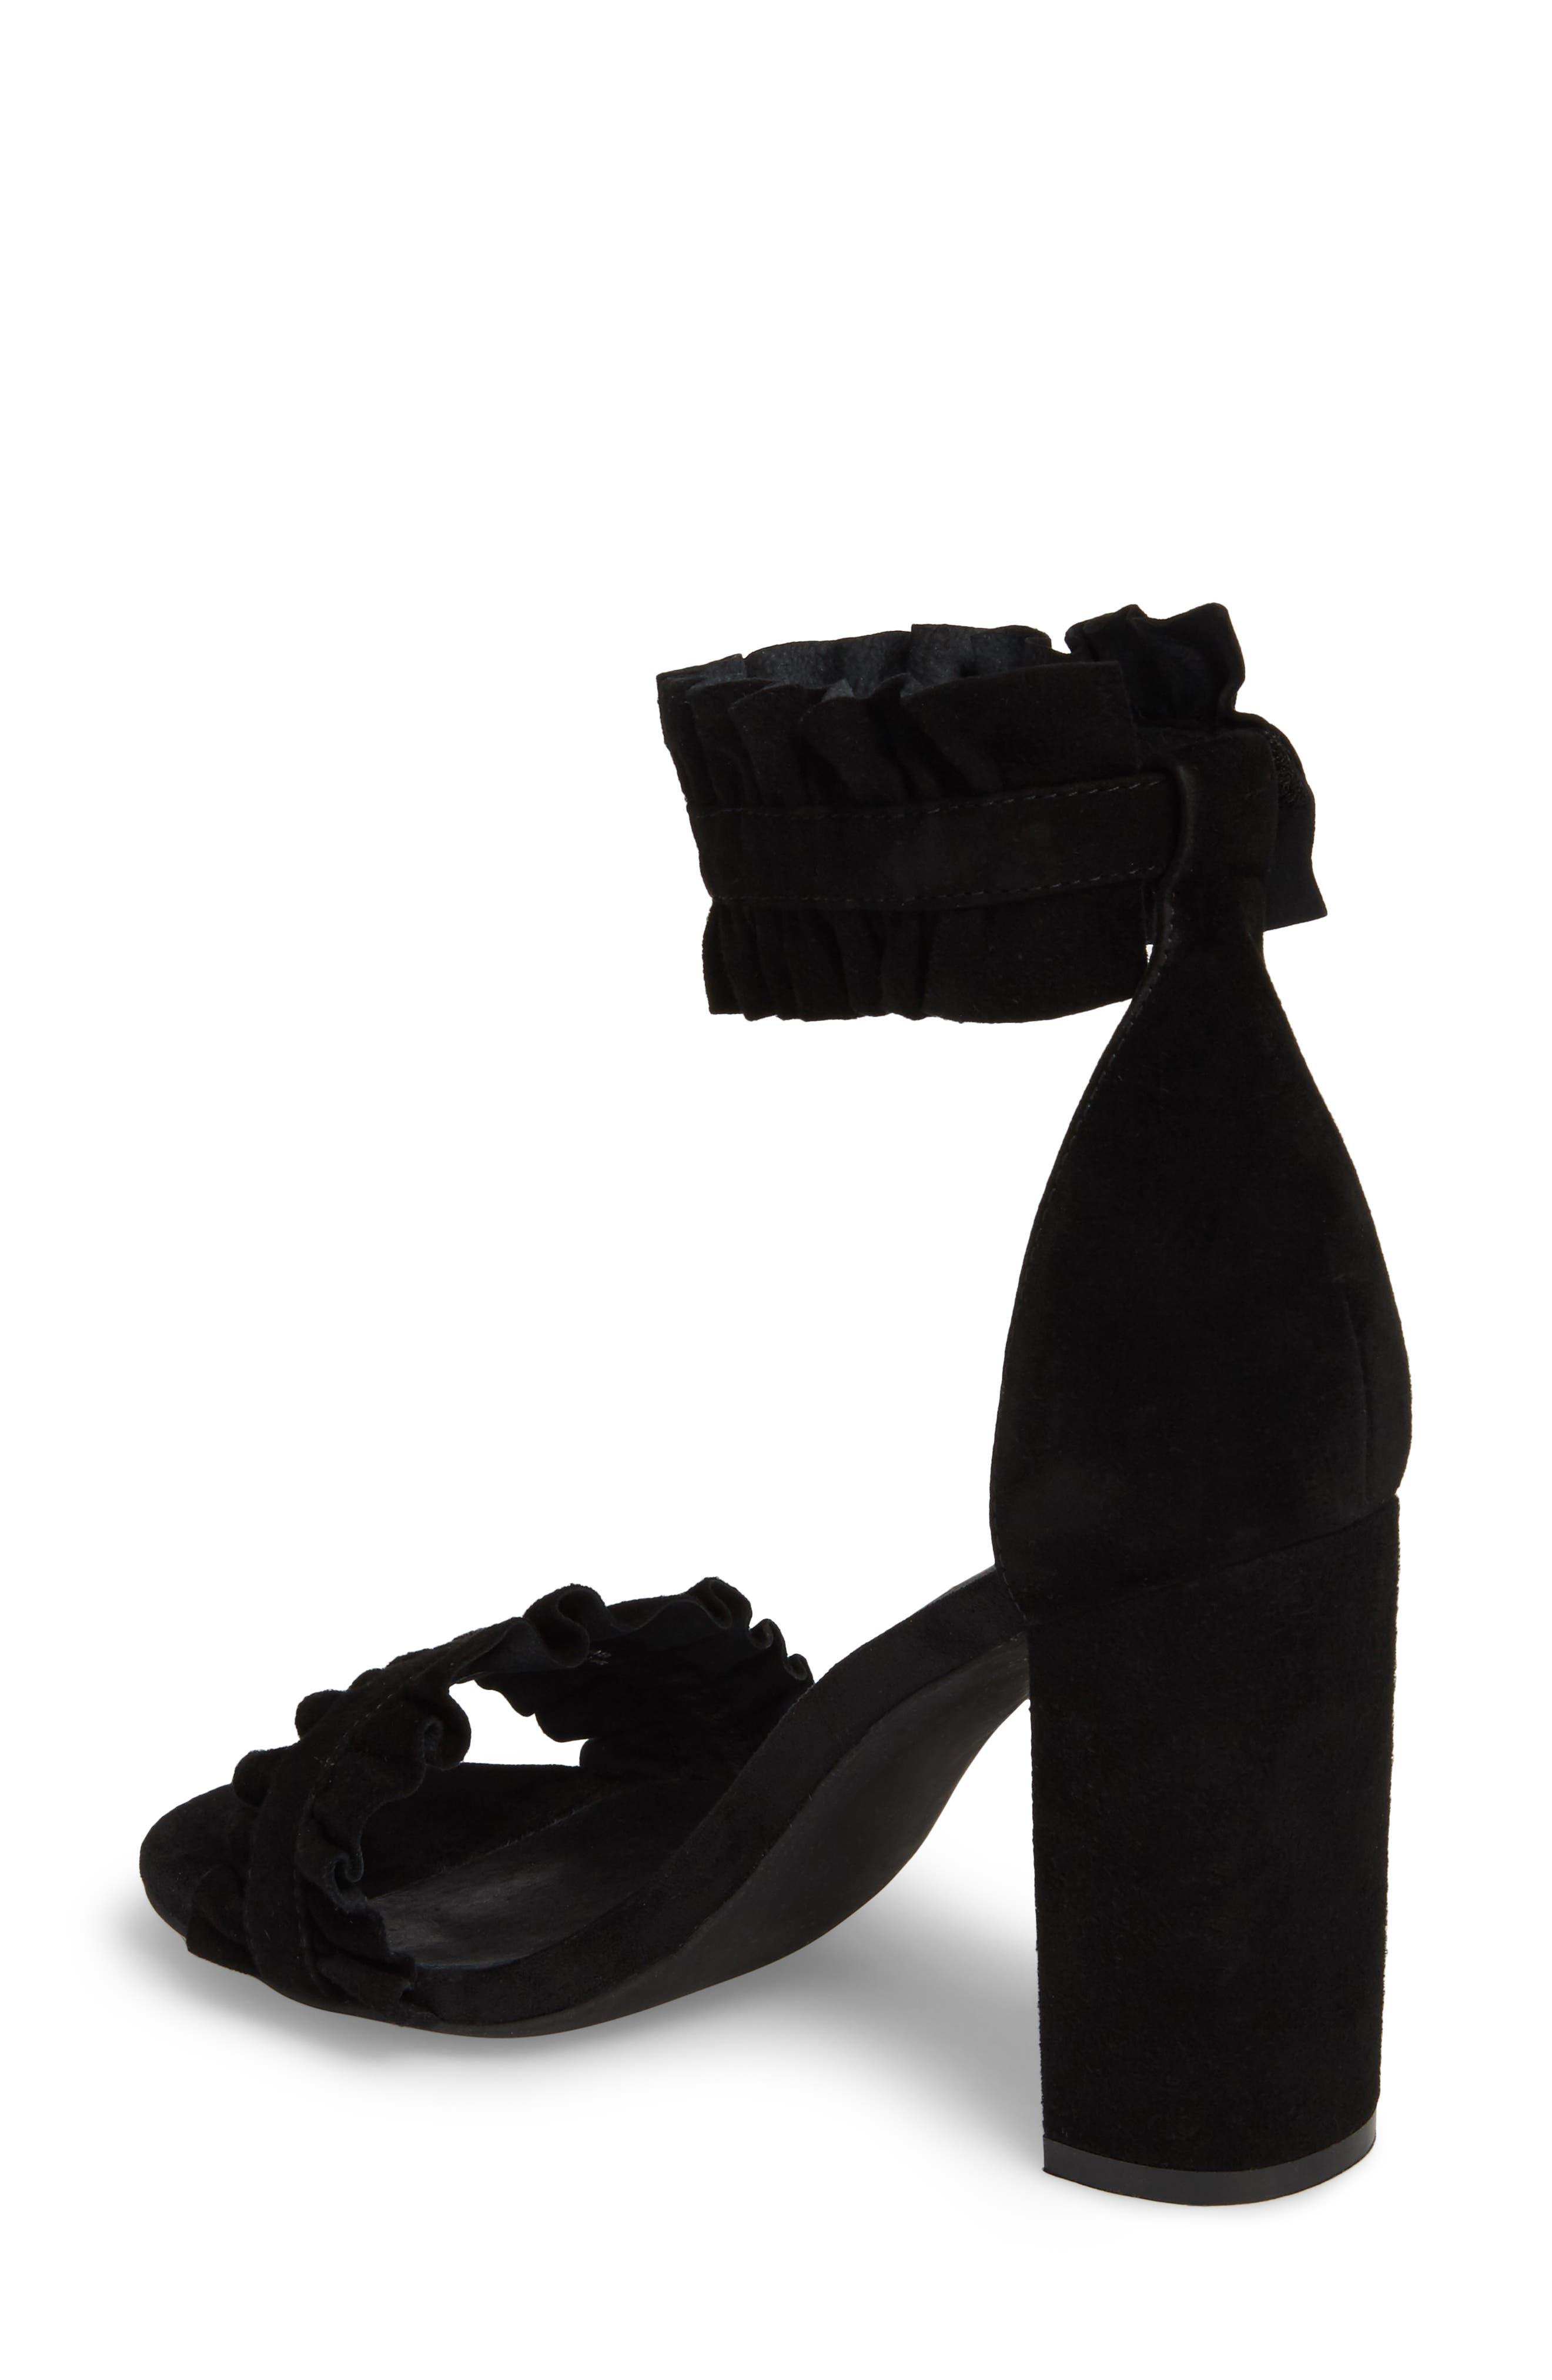 Lindsay Dome Studded Sandal,                             Alternate thumbnail 2, color,                             004